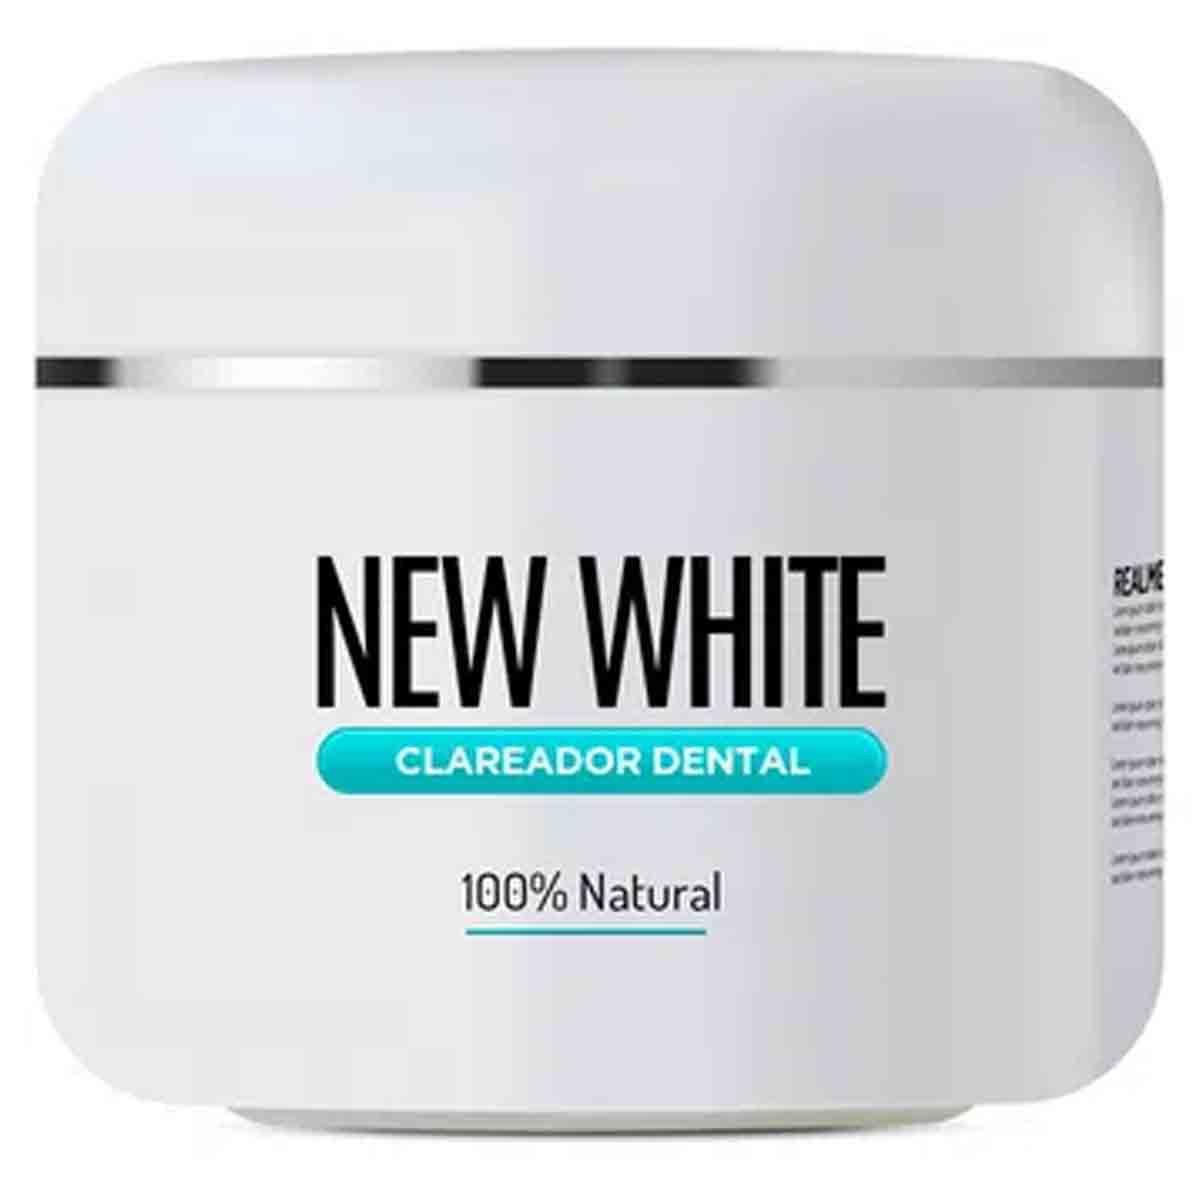 Clareador Dental New White 100% Natural 11g - Vitabe